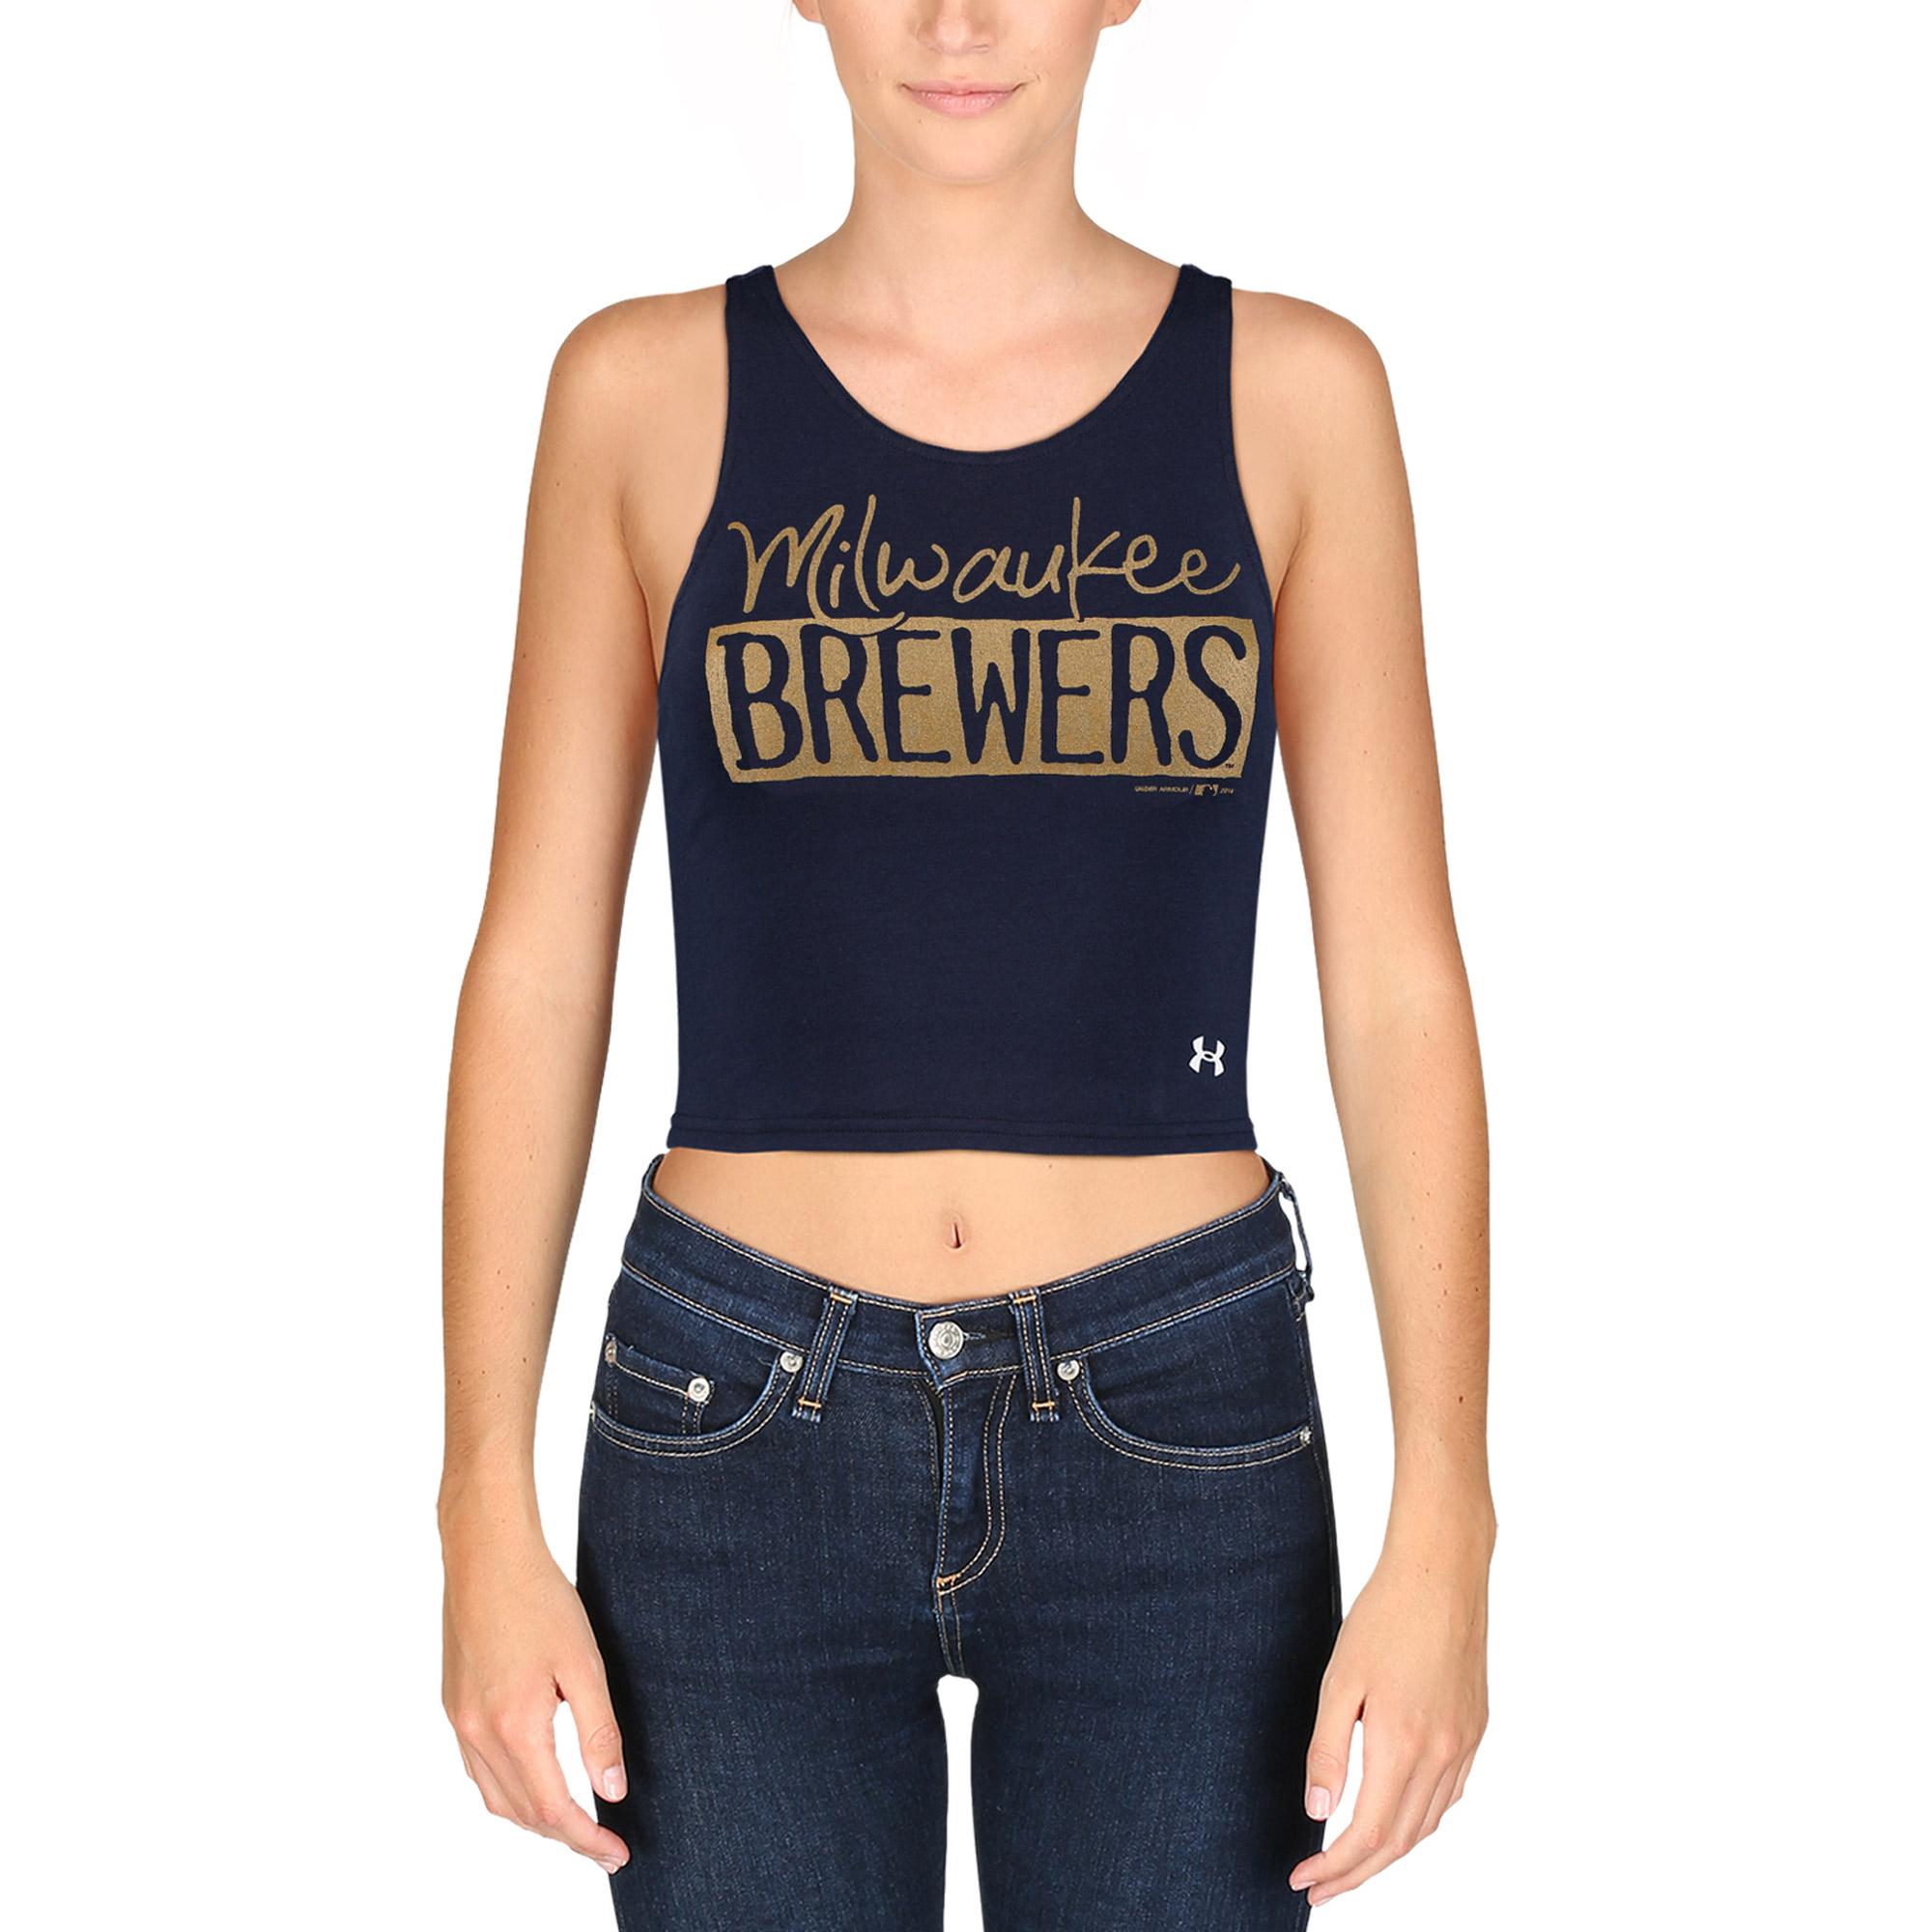 Milwaukee Brewers Under Armour Women's Barlette Tank Top - Navy